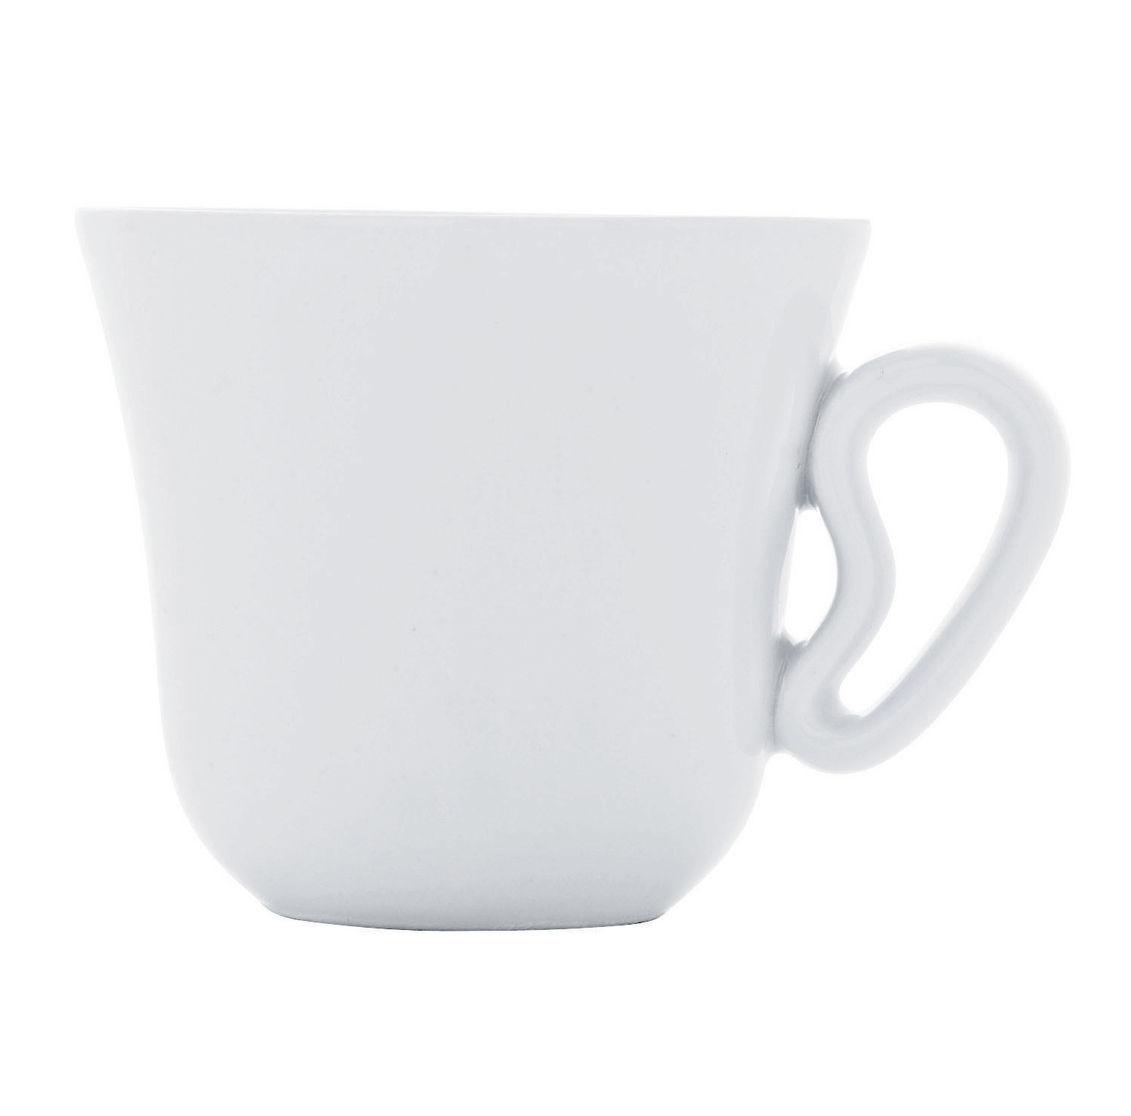 Tableware - Coffee Mugs & Tea Cups - Ku Mocha cup by Alessi - Mocha cup - China